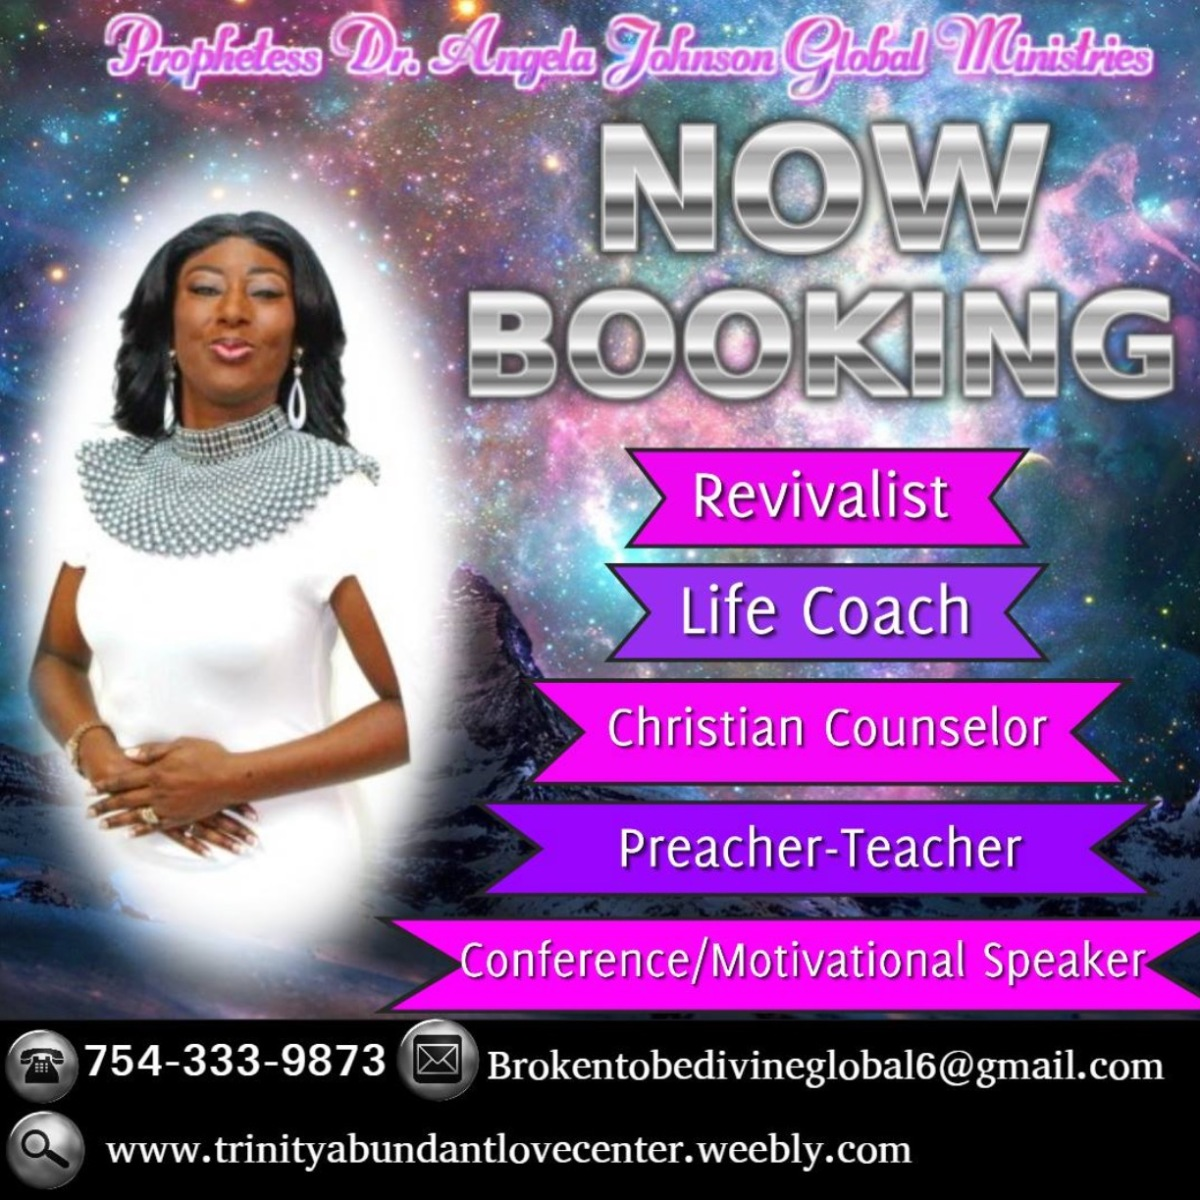 Prophetess Dr. Angela Johnson